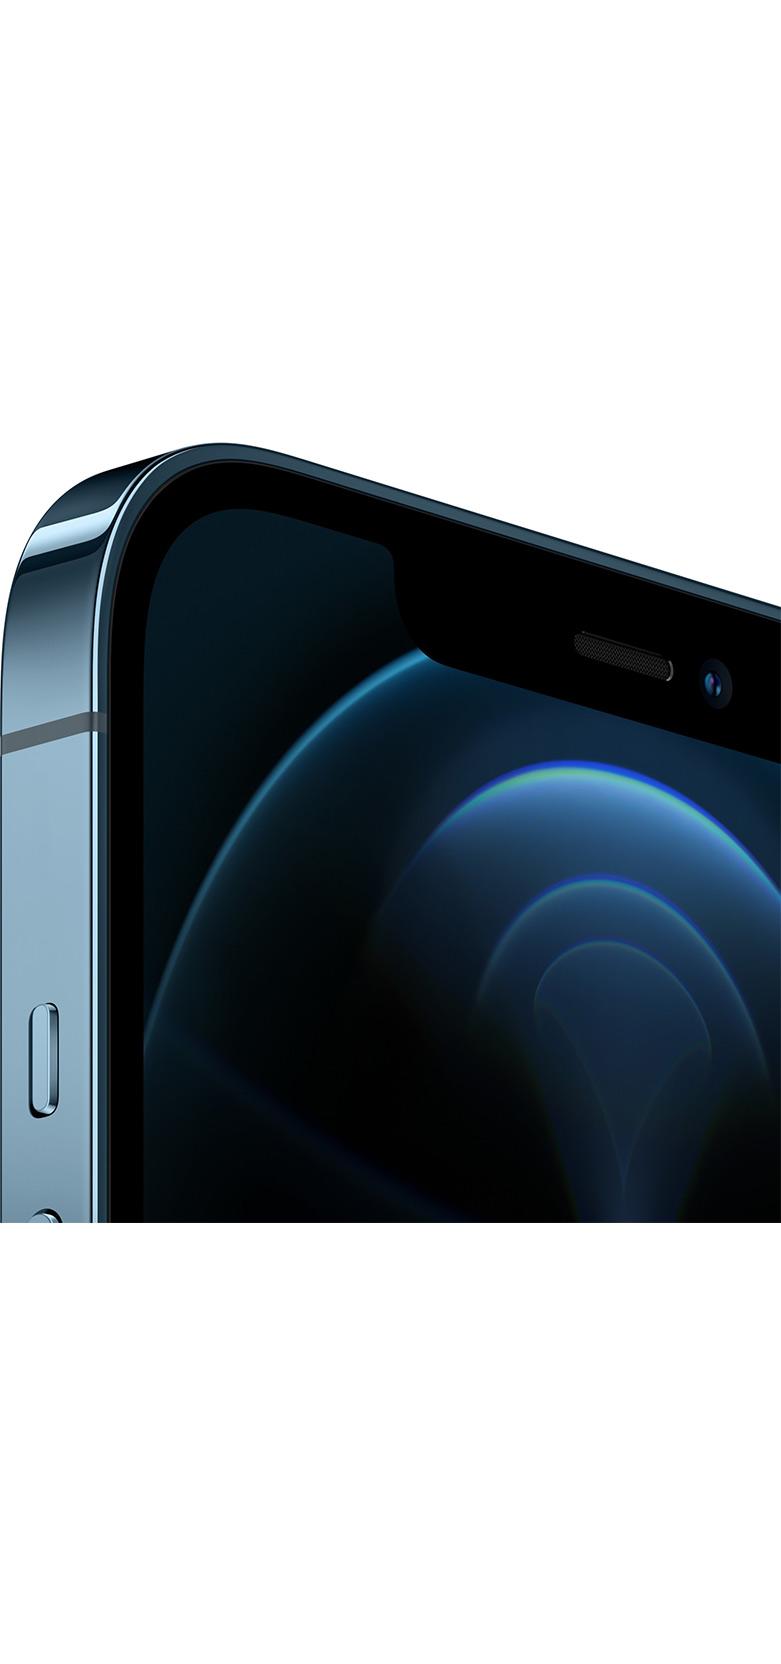 Apple iPhone 12 Pro Max Pacific Blue 128GB